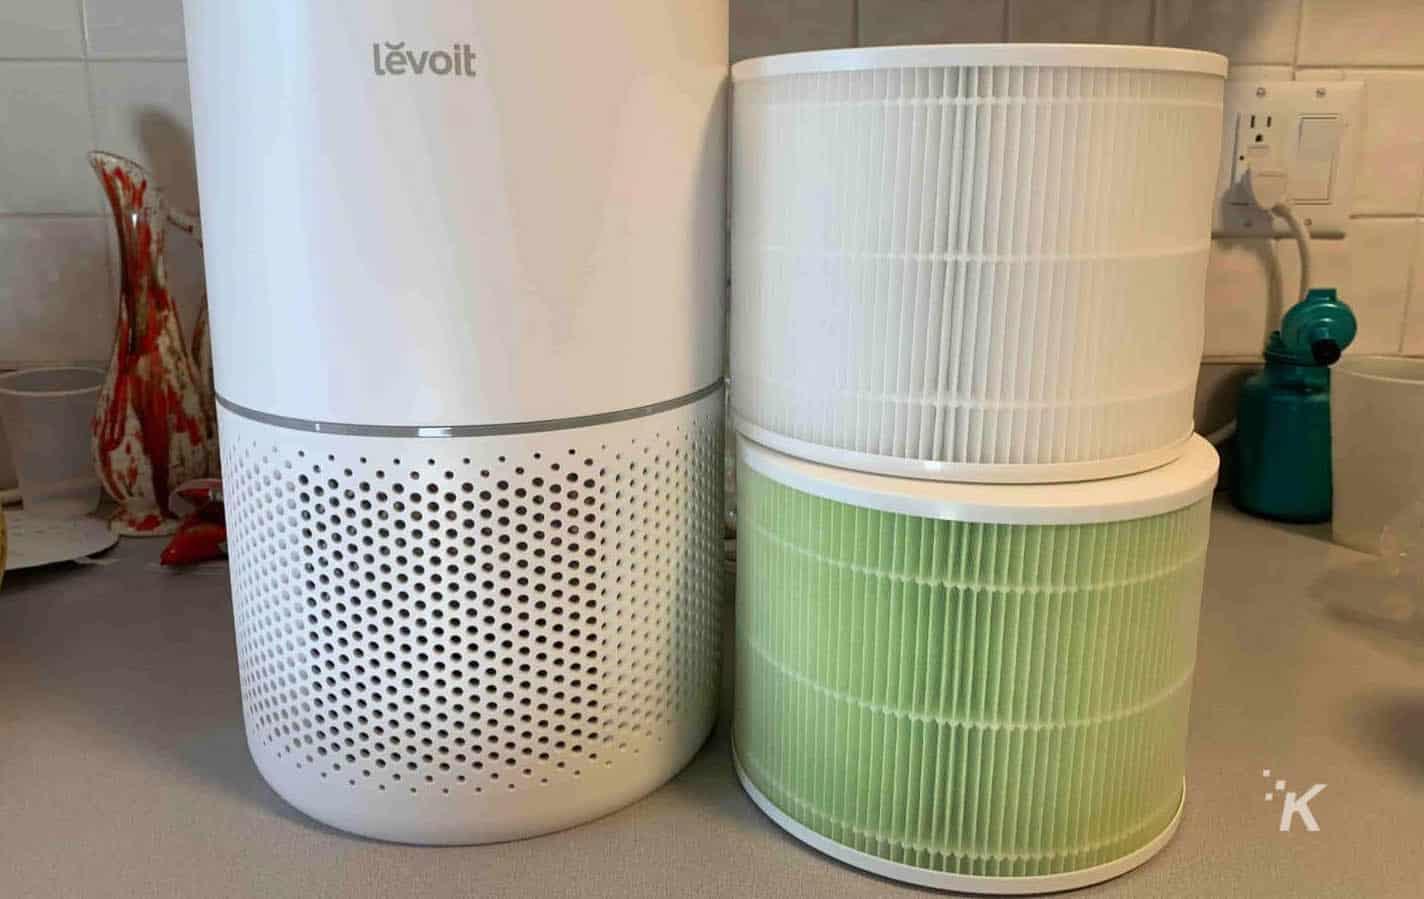 levoit air purifier filter options